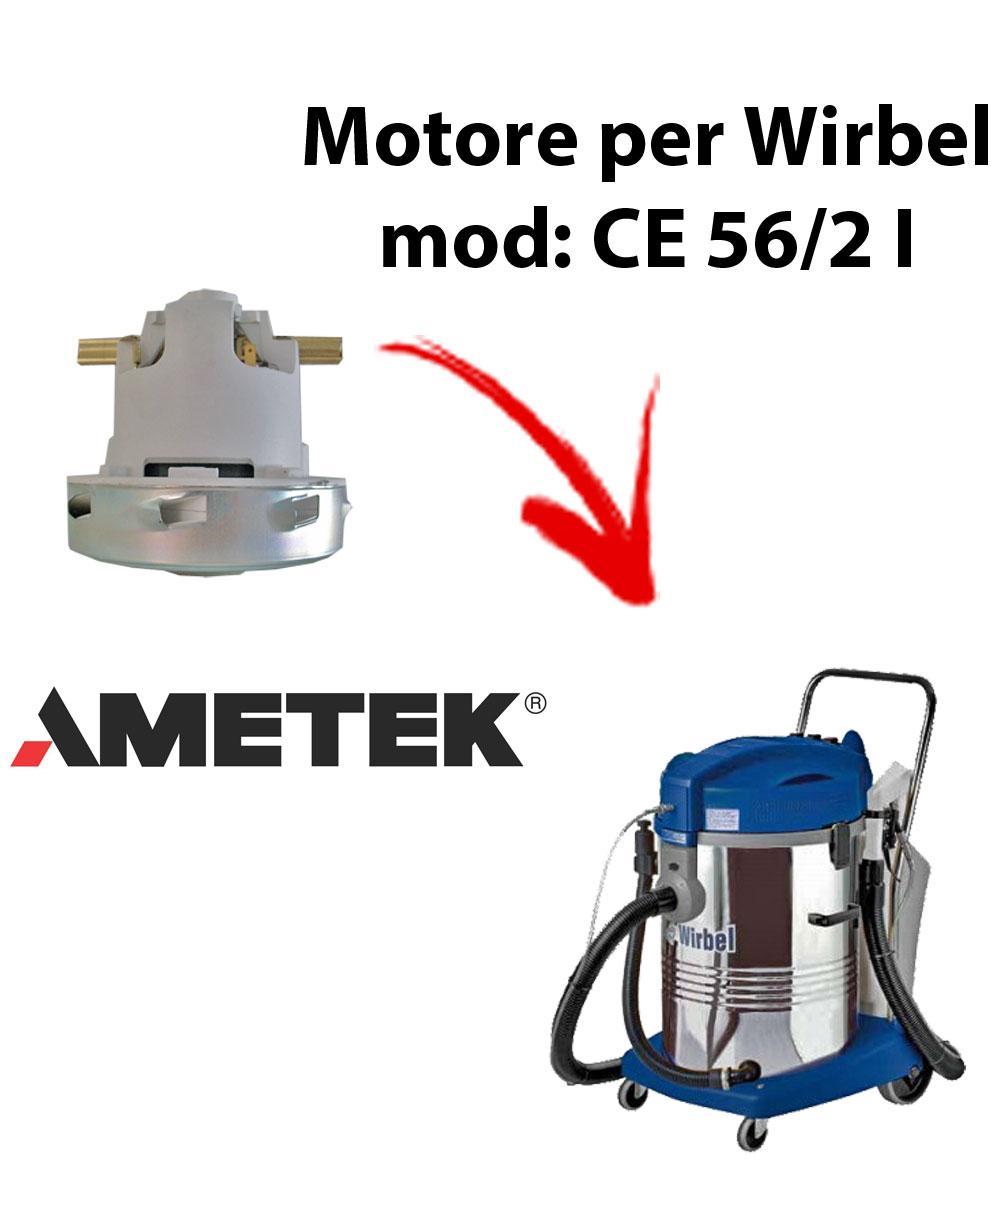 Motore Ametek di aspirazione per Aspirapolvere WIRBEL, modello CE 56/2 I